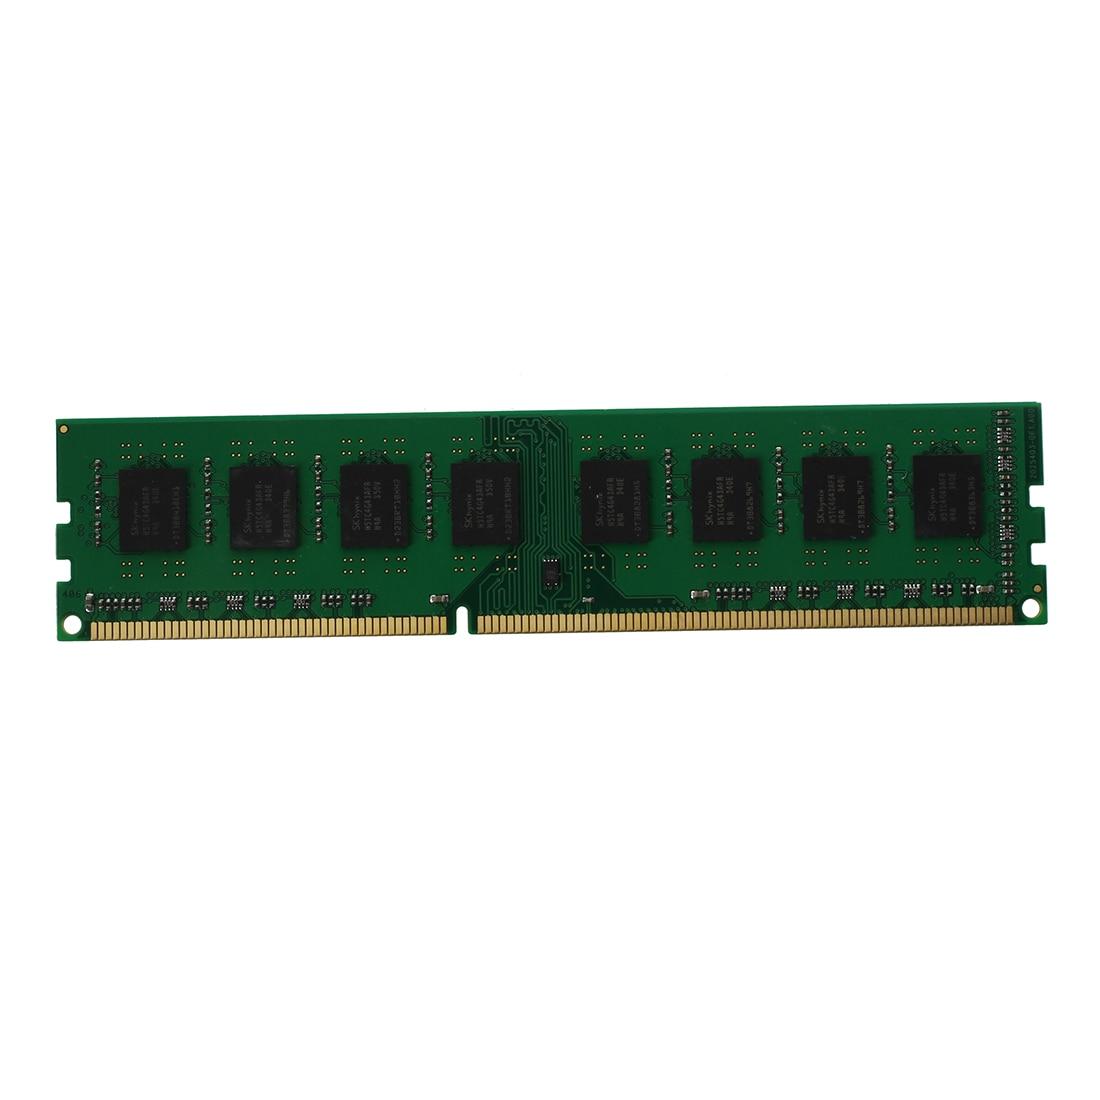 8GB PC Memory Module RAM DDR3 PC3-10600 1333MHz DIMM Desktop For AMD System new sealed ddr3 1333mhz pc3 10600 8gb desktop ram memory full compatible ddr3 lifetime warranty